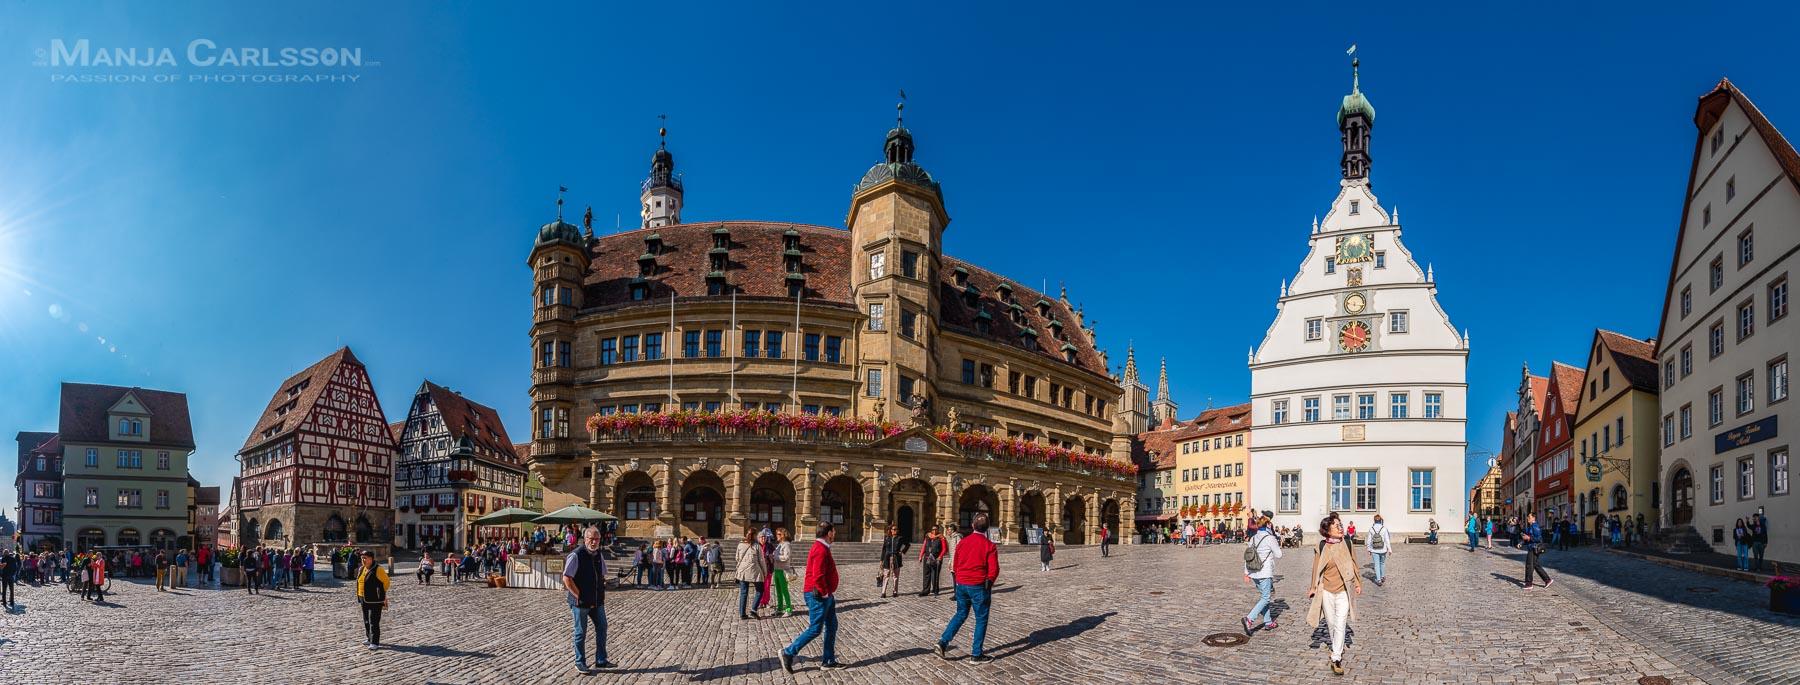 Rothenburg ob der Tauber - Markt - Panorama aus 15 HK-Fotos